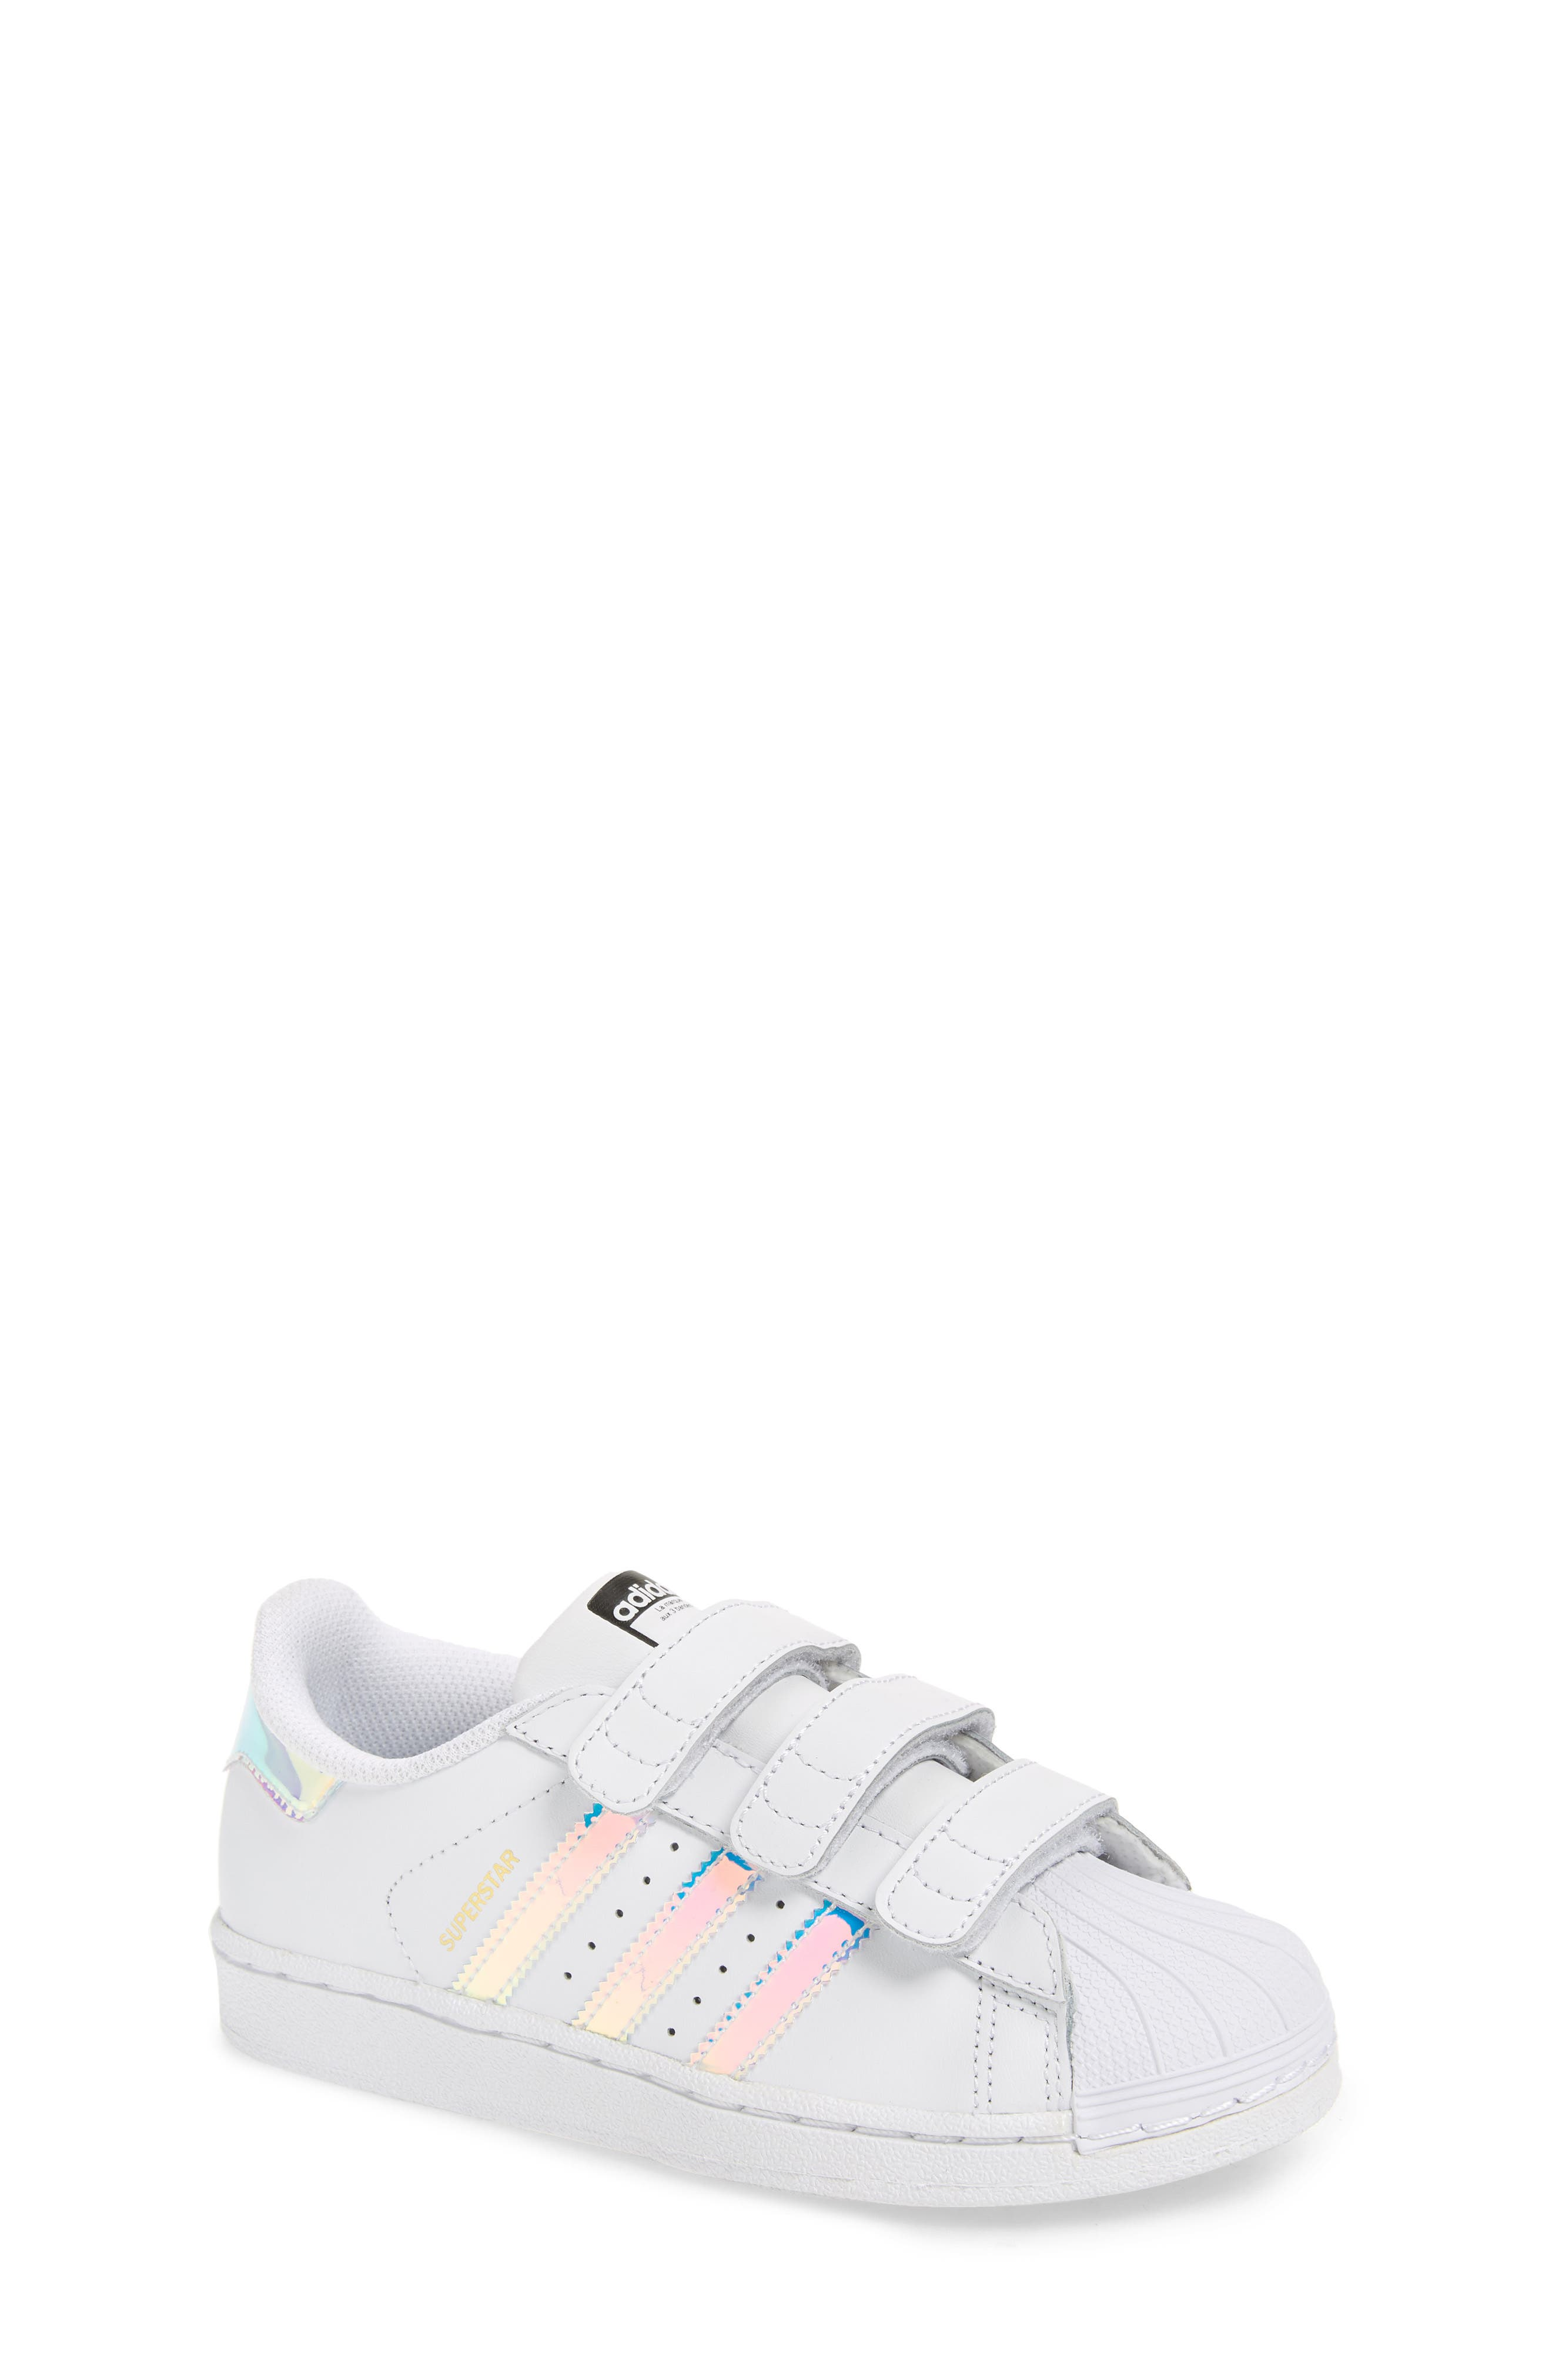 Superstar - Iridescent Sneaker,                         Main,                         color, 100